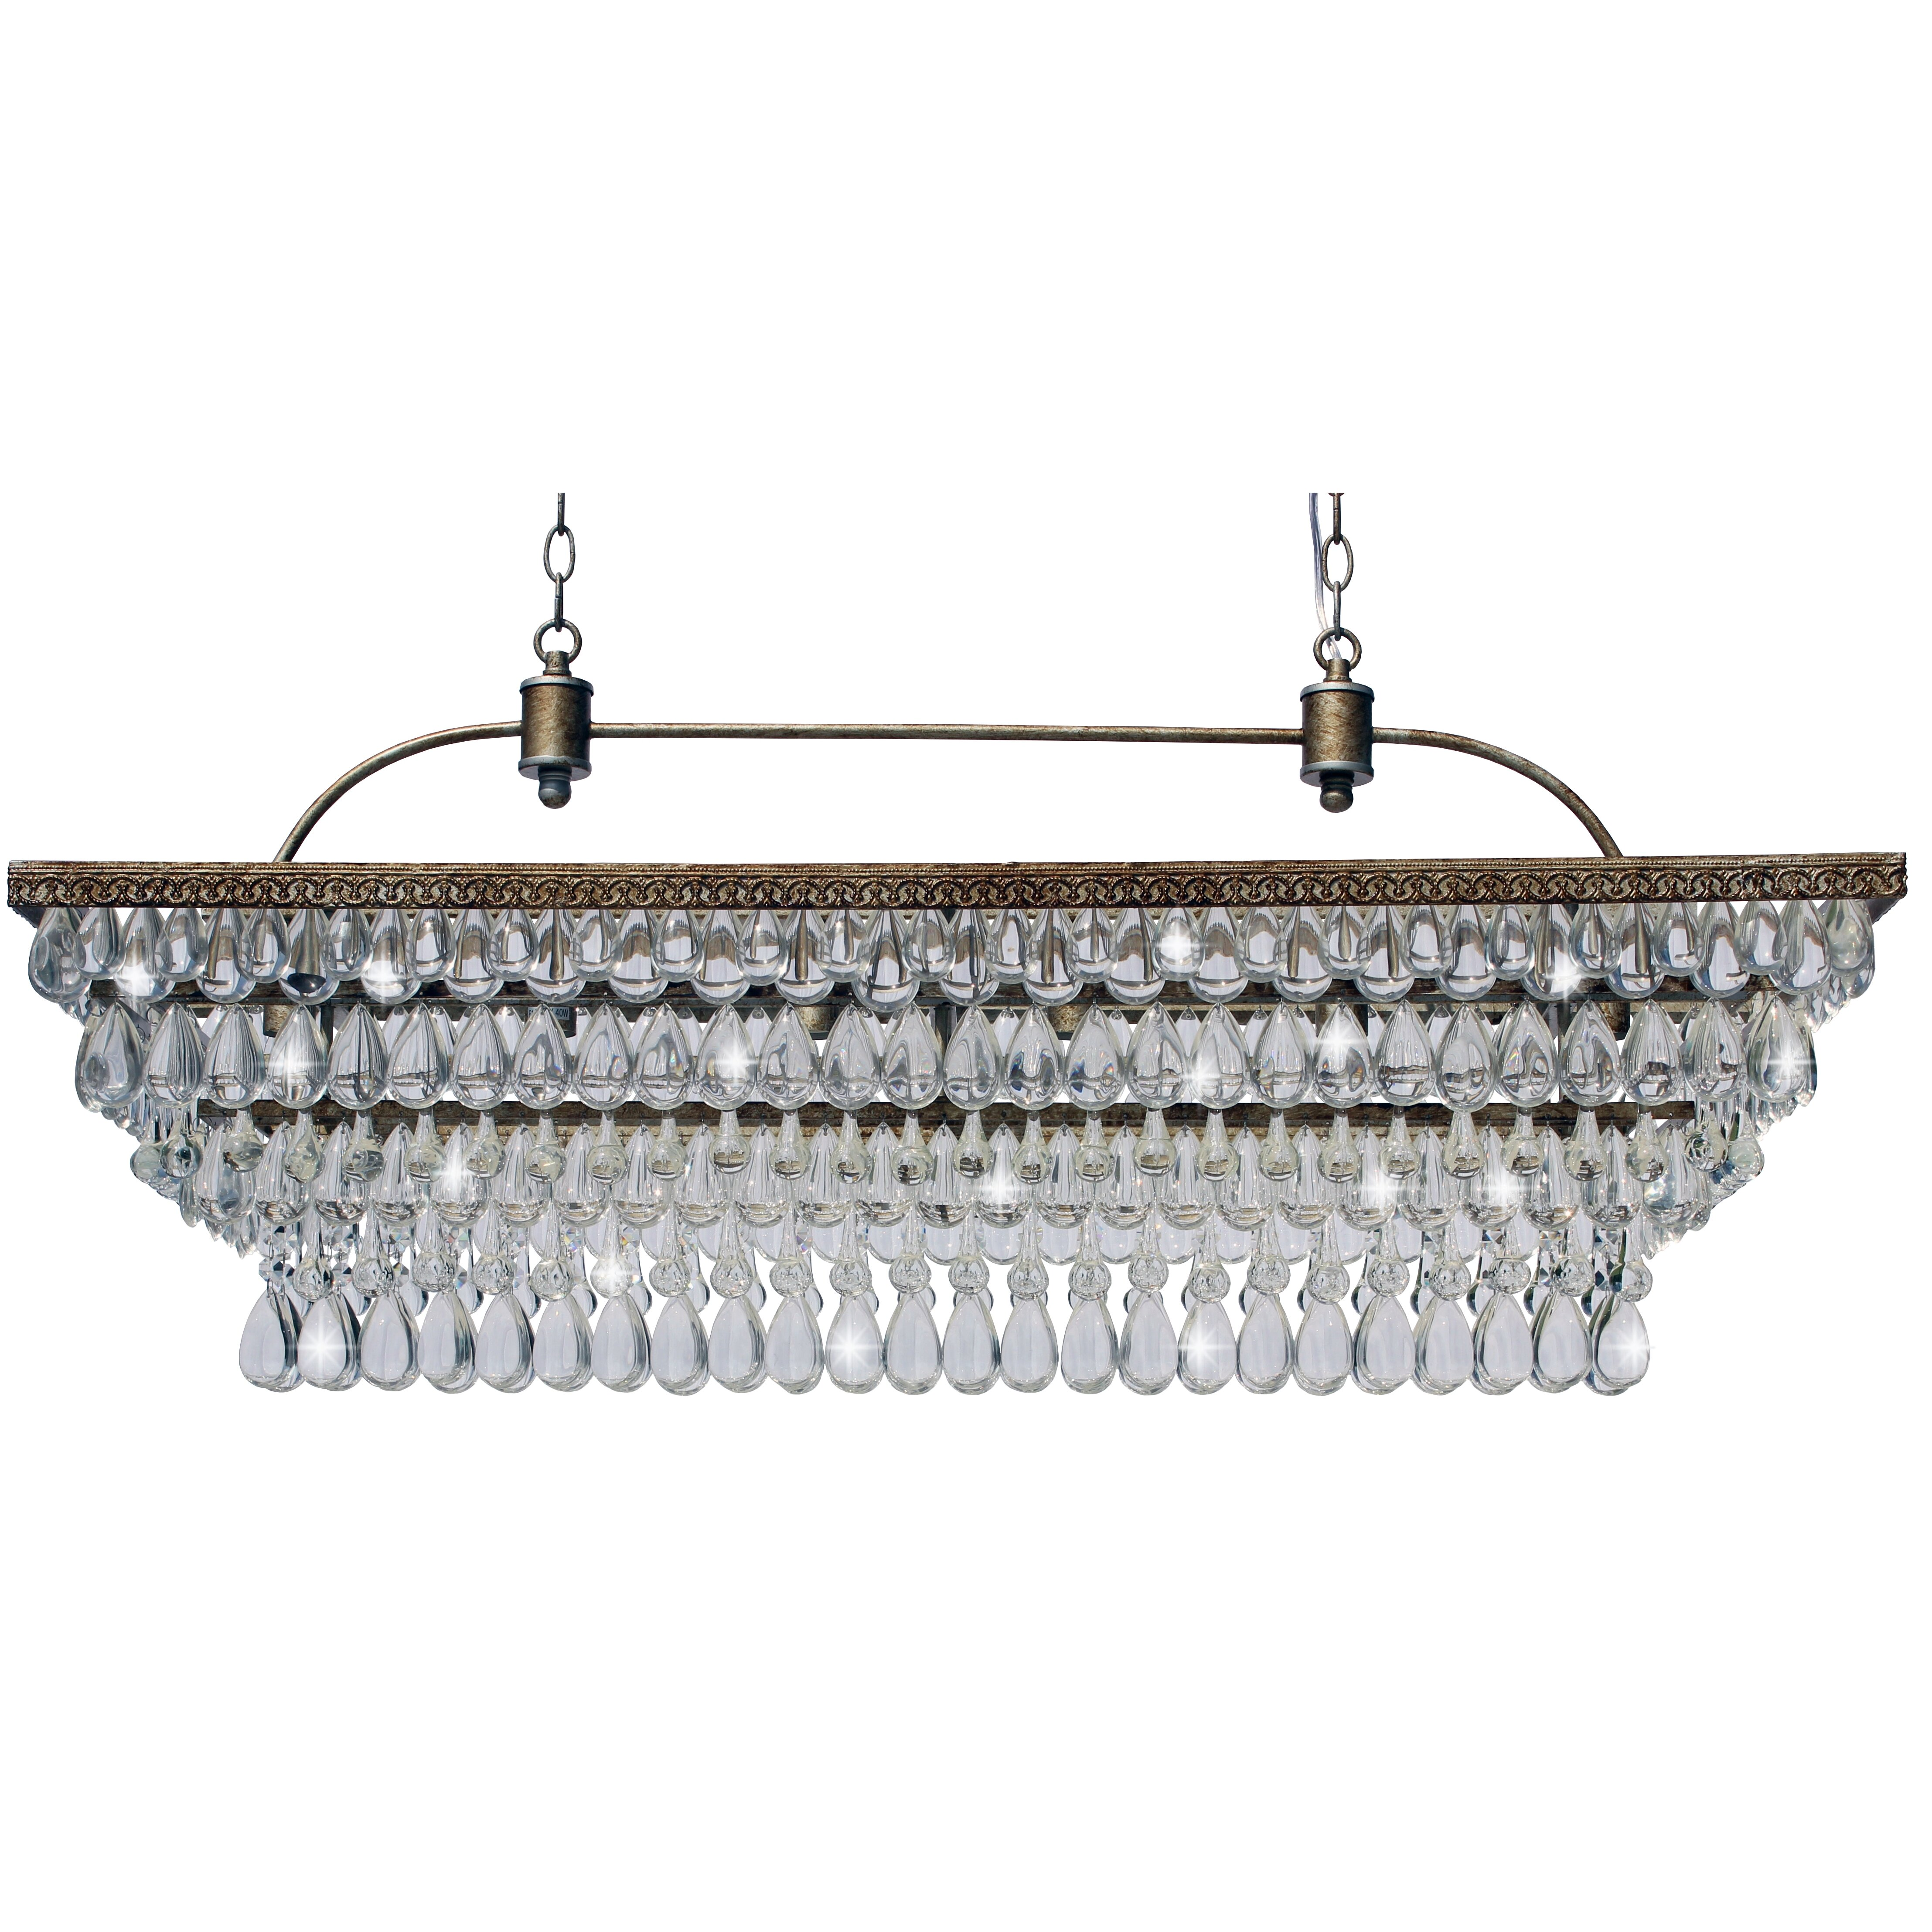 Pottery barn celeste chandelier - Lightupmyhome The Weston 6 Light Crystal Chandelier